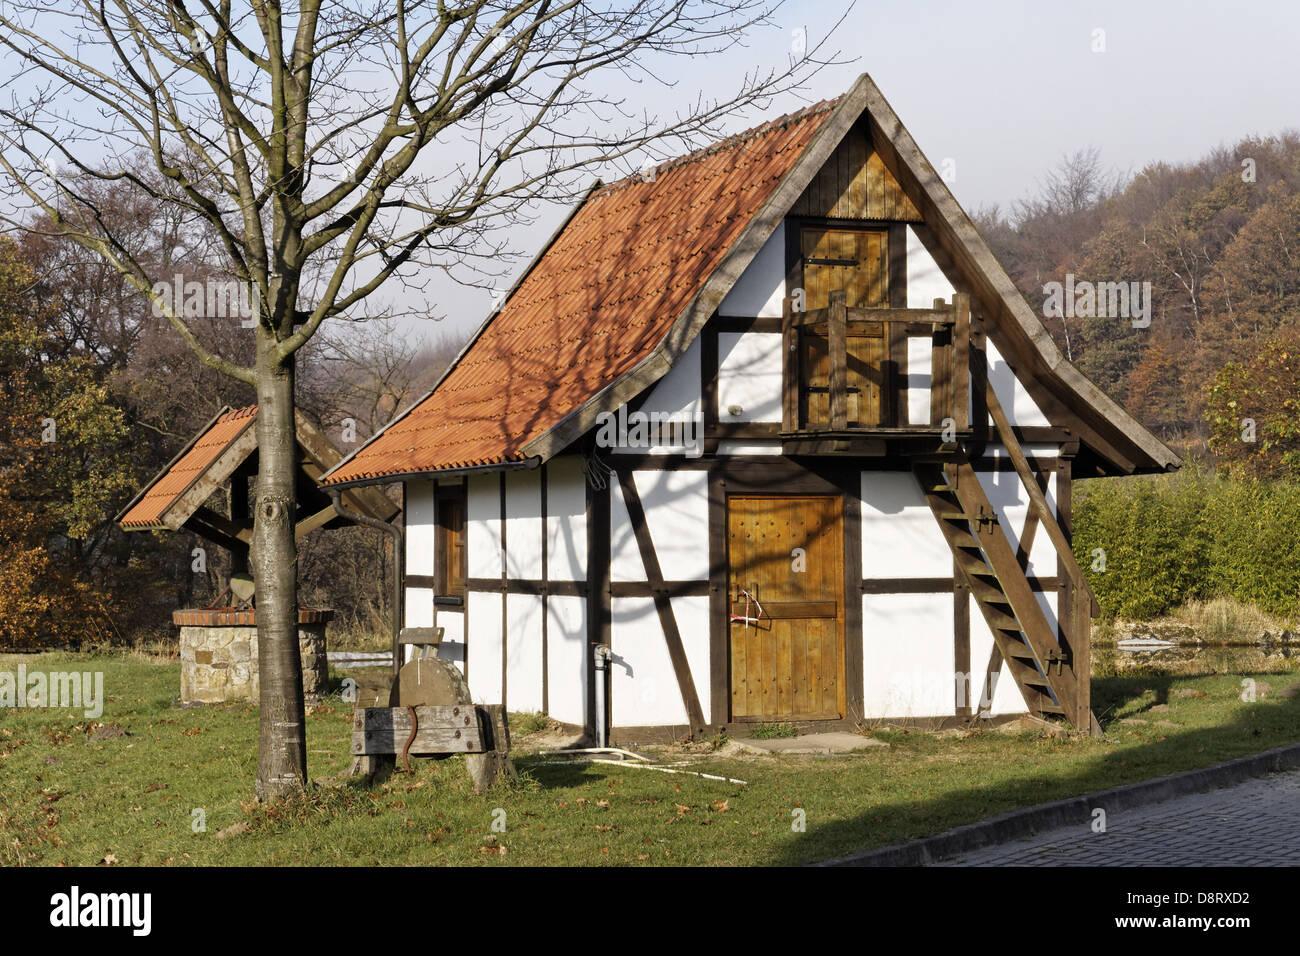 Little garden house - Little Garden House In Lower Saxony Germany Stock Photo